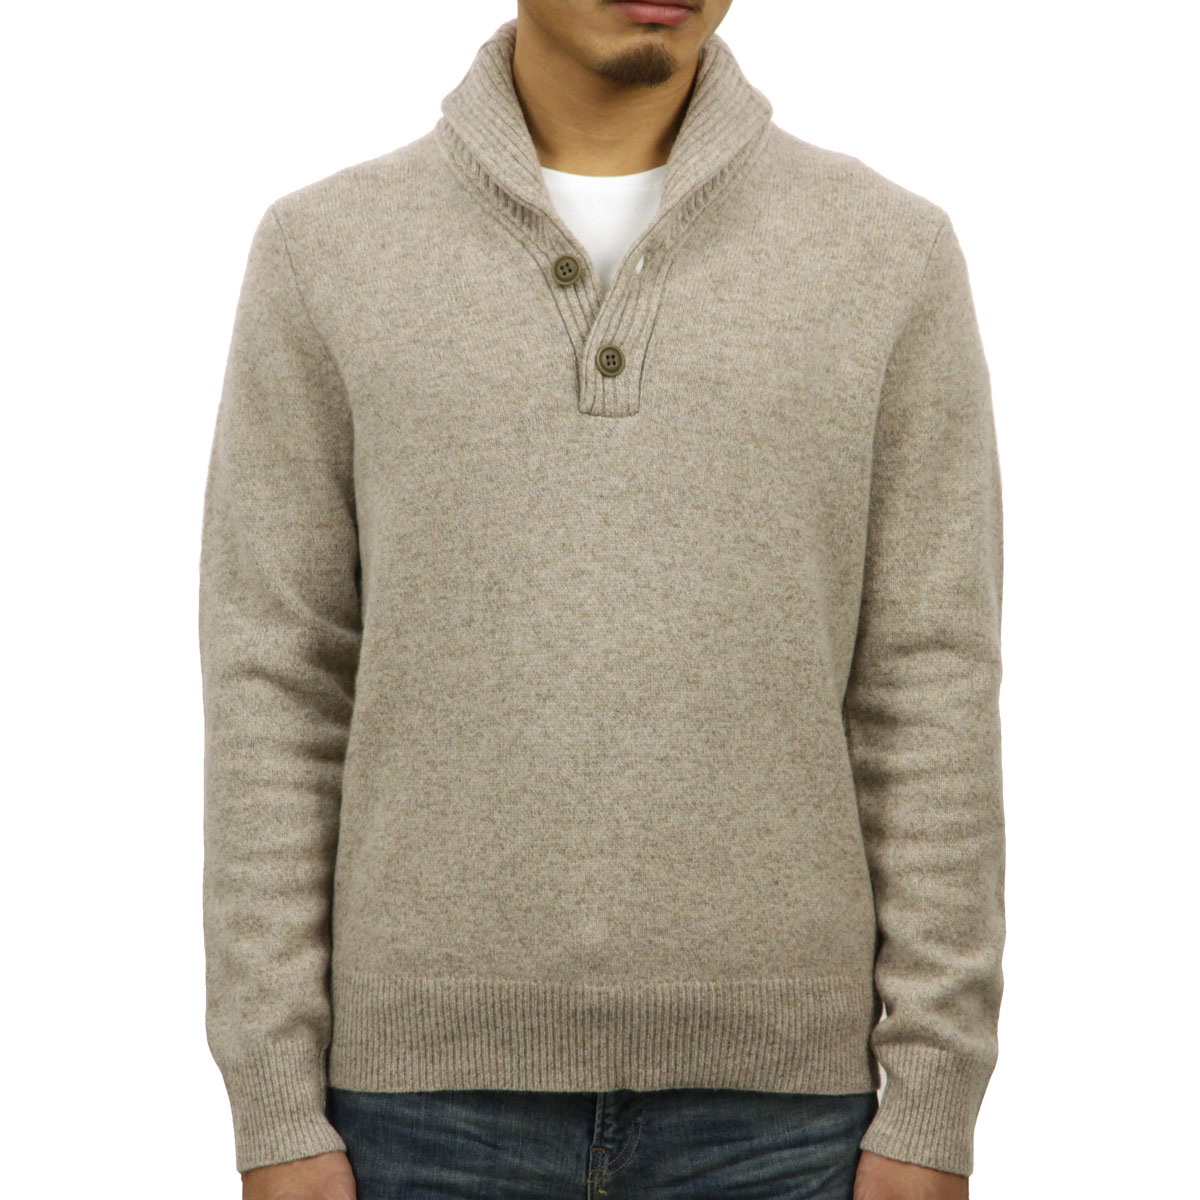 b72c4ad7de3 Rakuten Ichiba shop MIXON  J.crew J.CREW genuine men's sweater ...